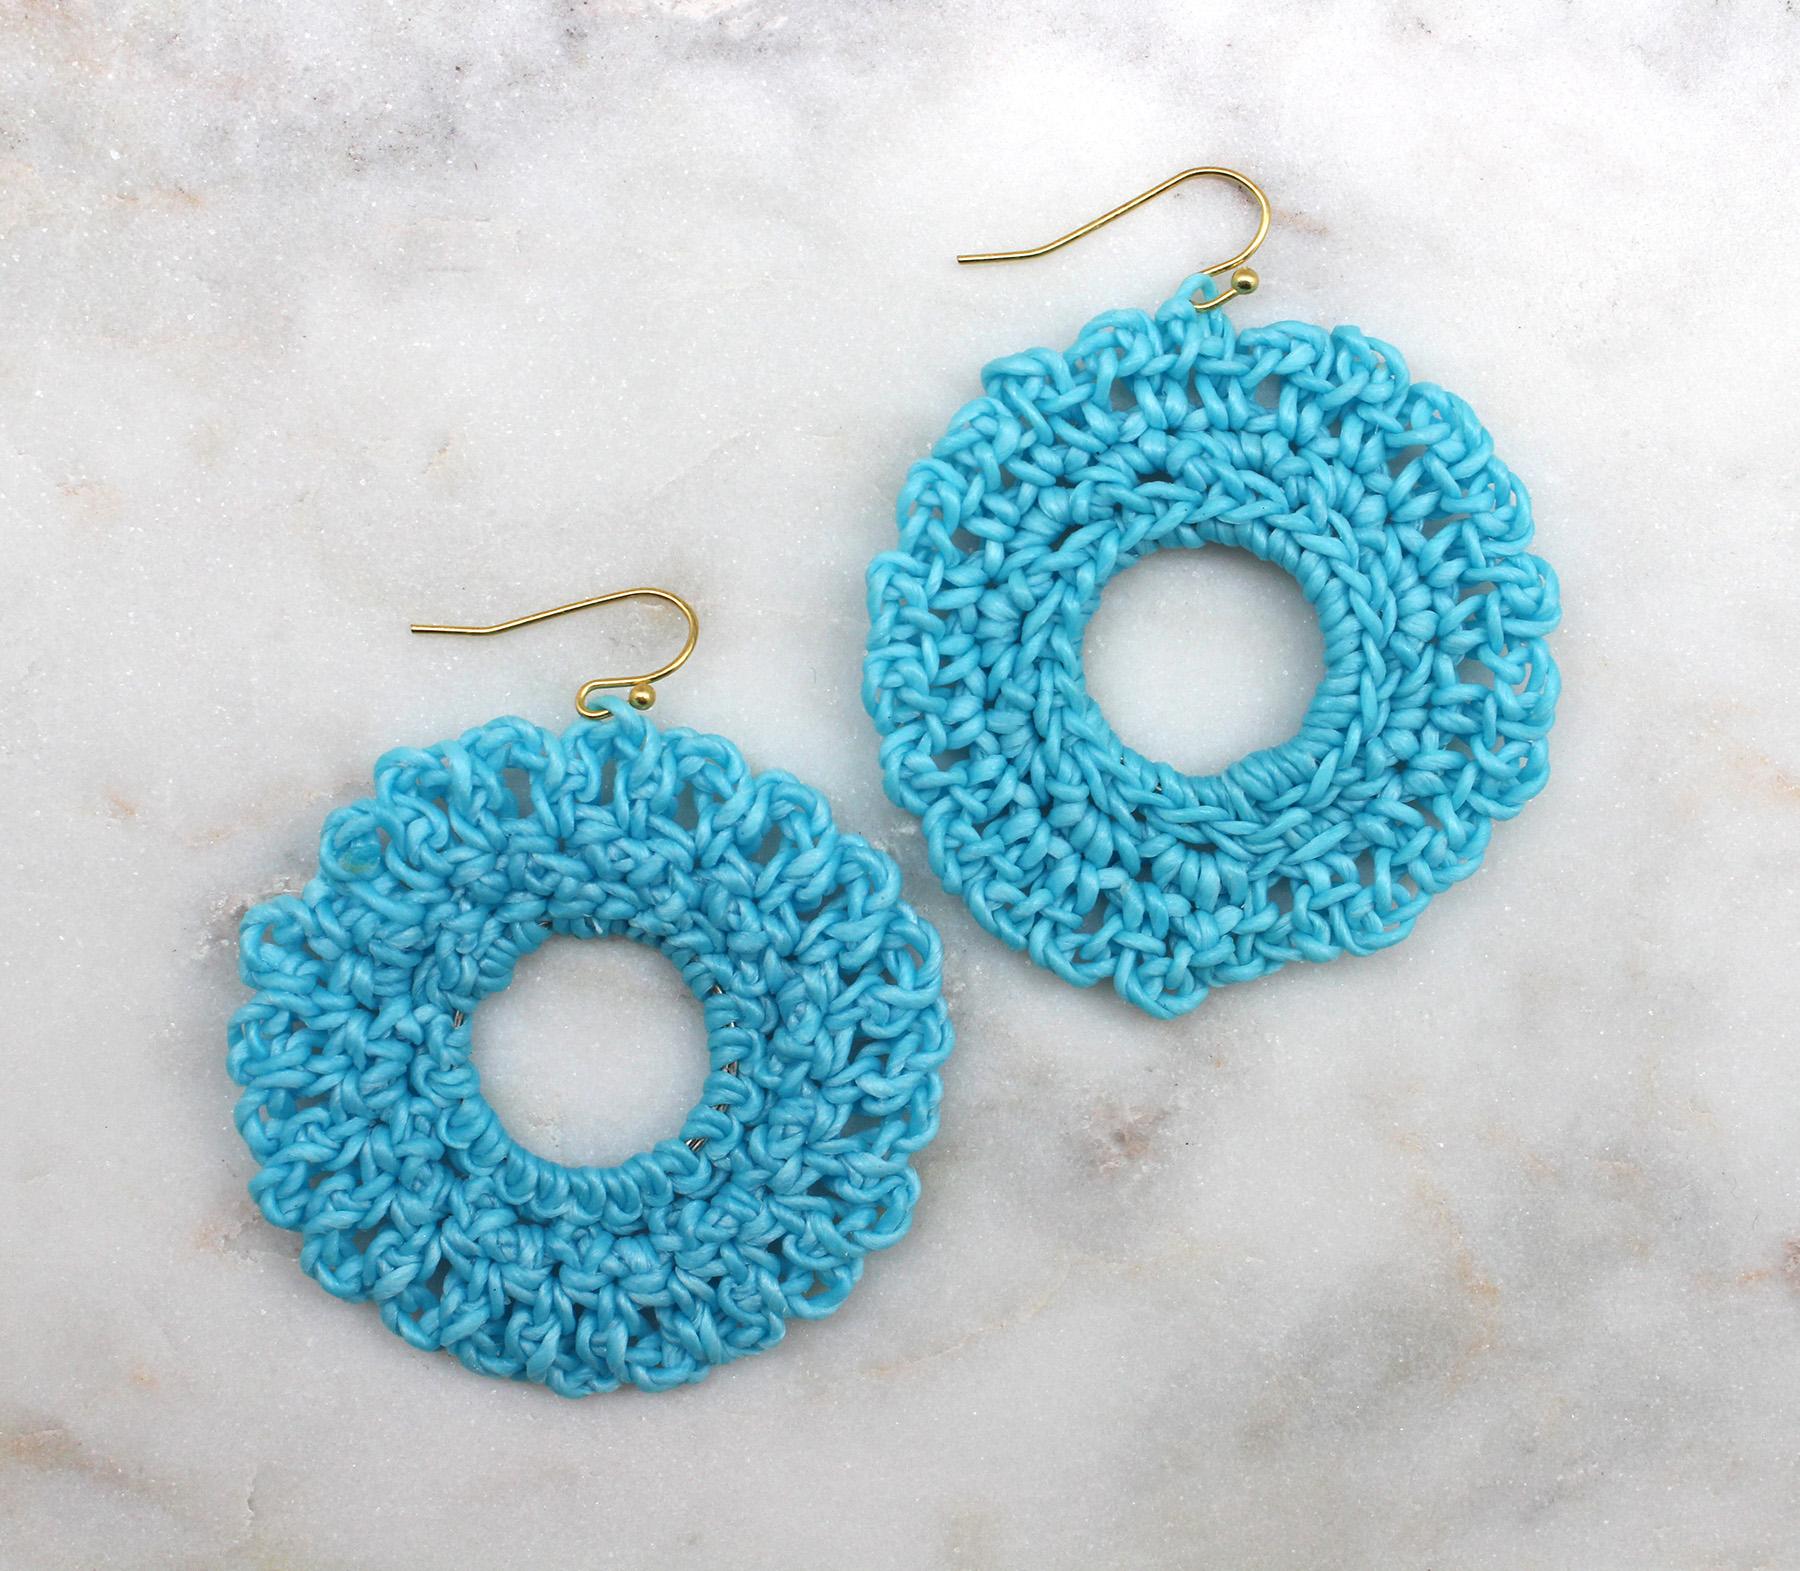 Crochet Hook Earrings: Round Crochet Earrings - Best Of Everything